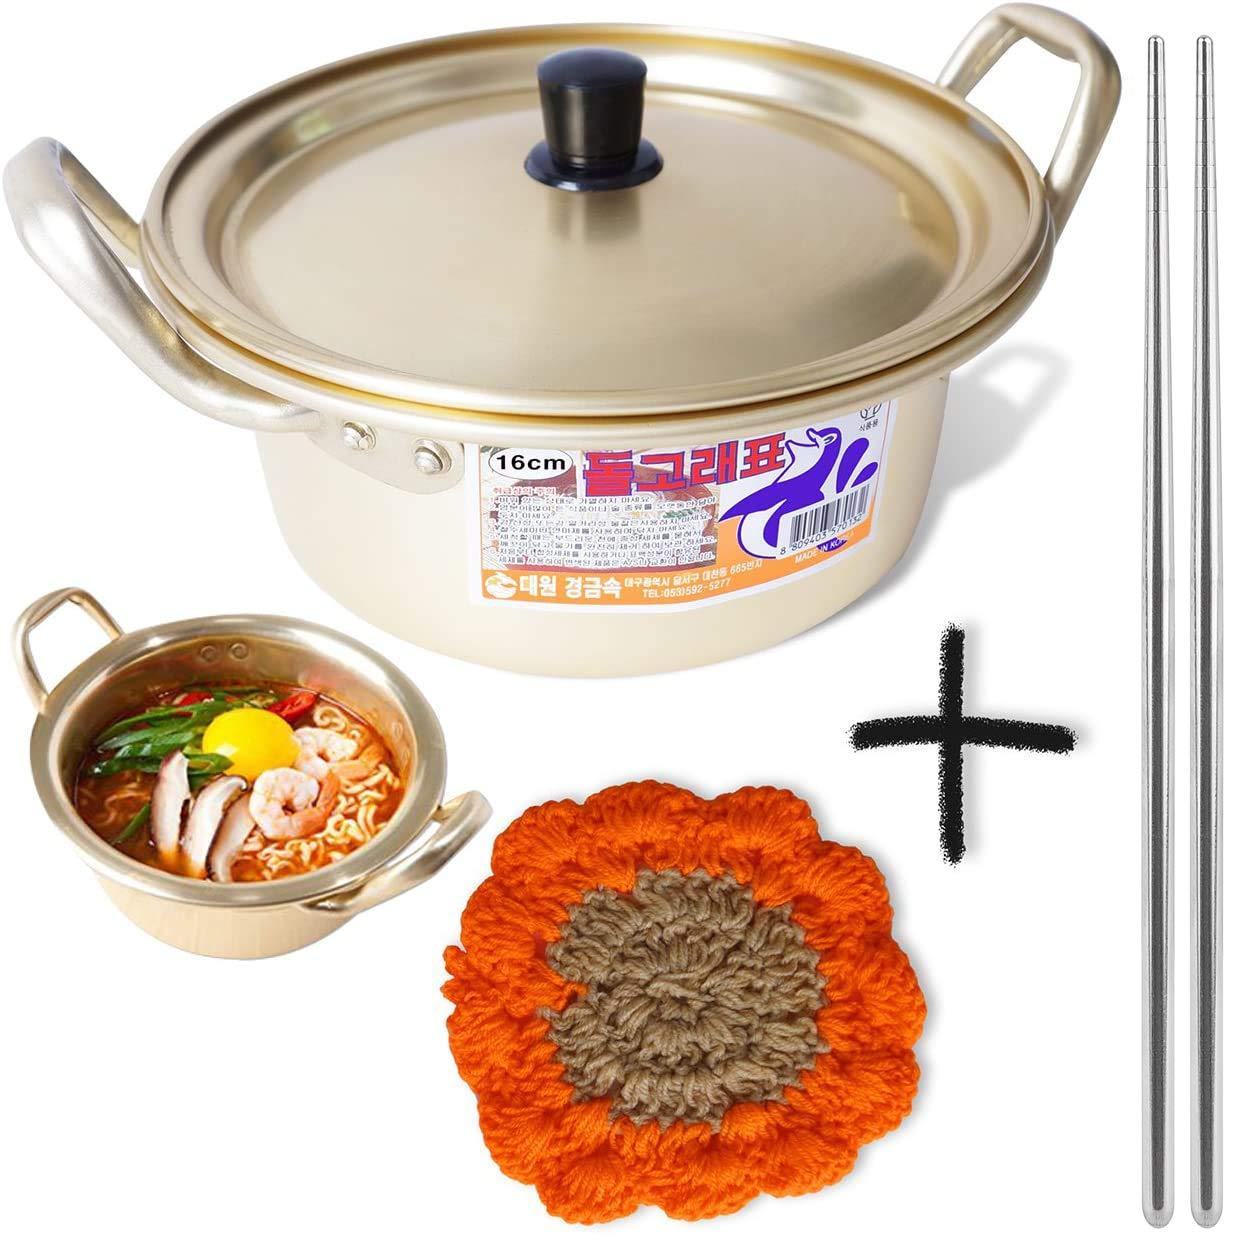 "Korean Ramen Noodle Pot 6.3""(16cm) + Chopstick (1 Pair) + Dish scrubber, Made in Korea (Standard version)"